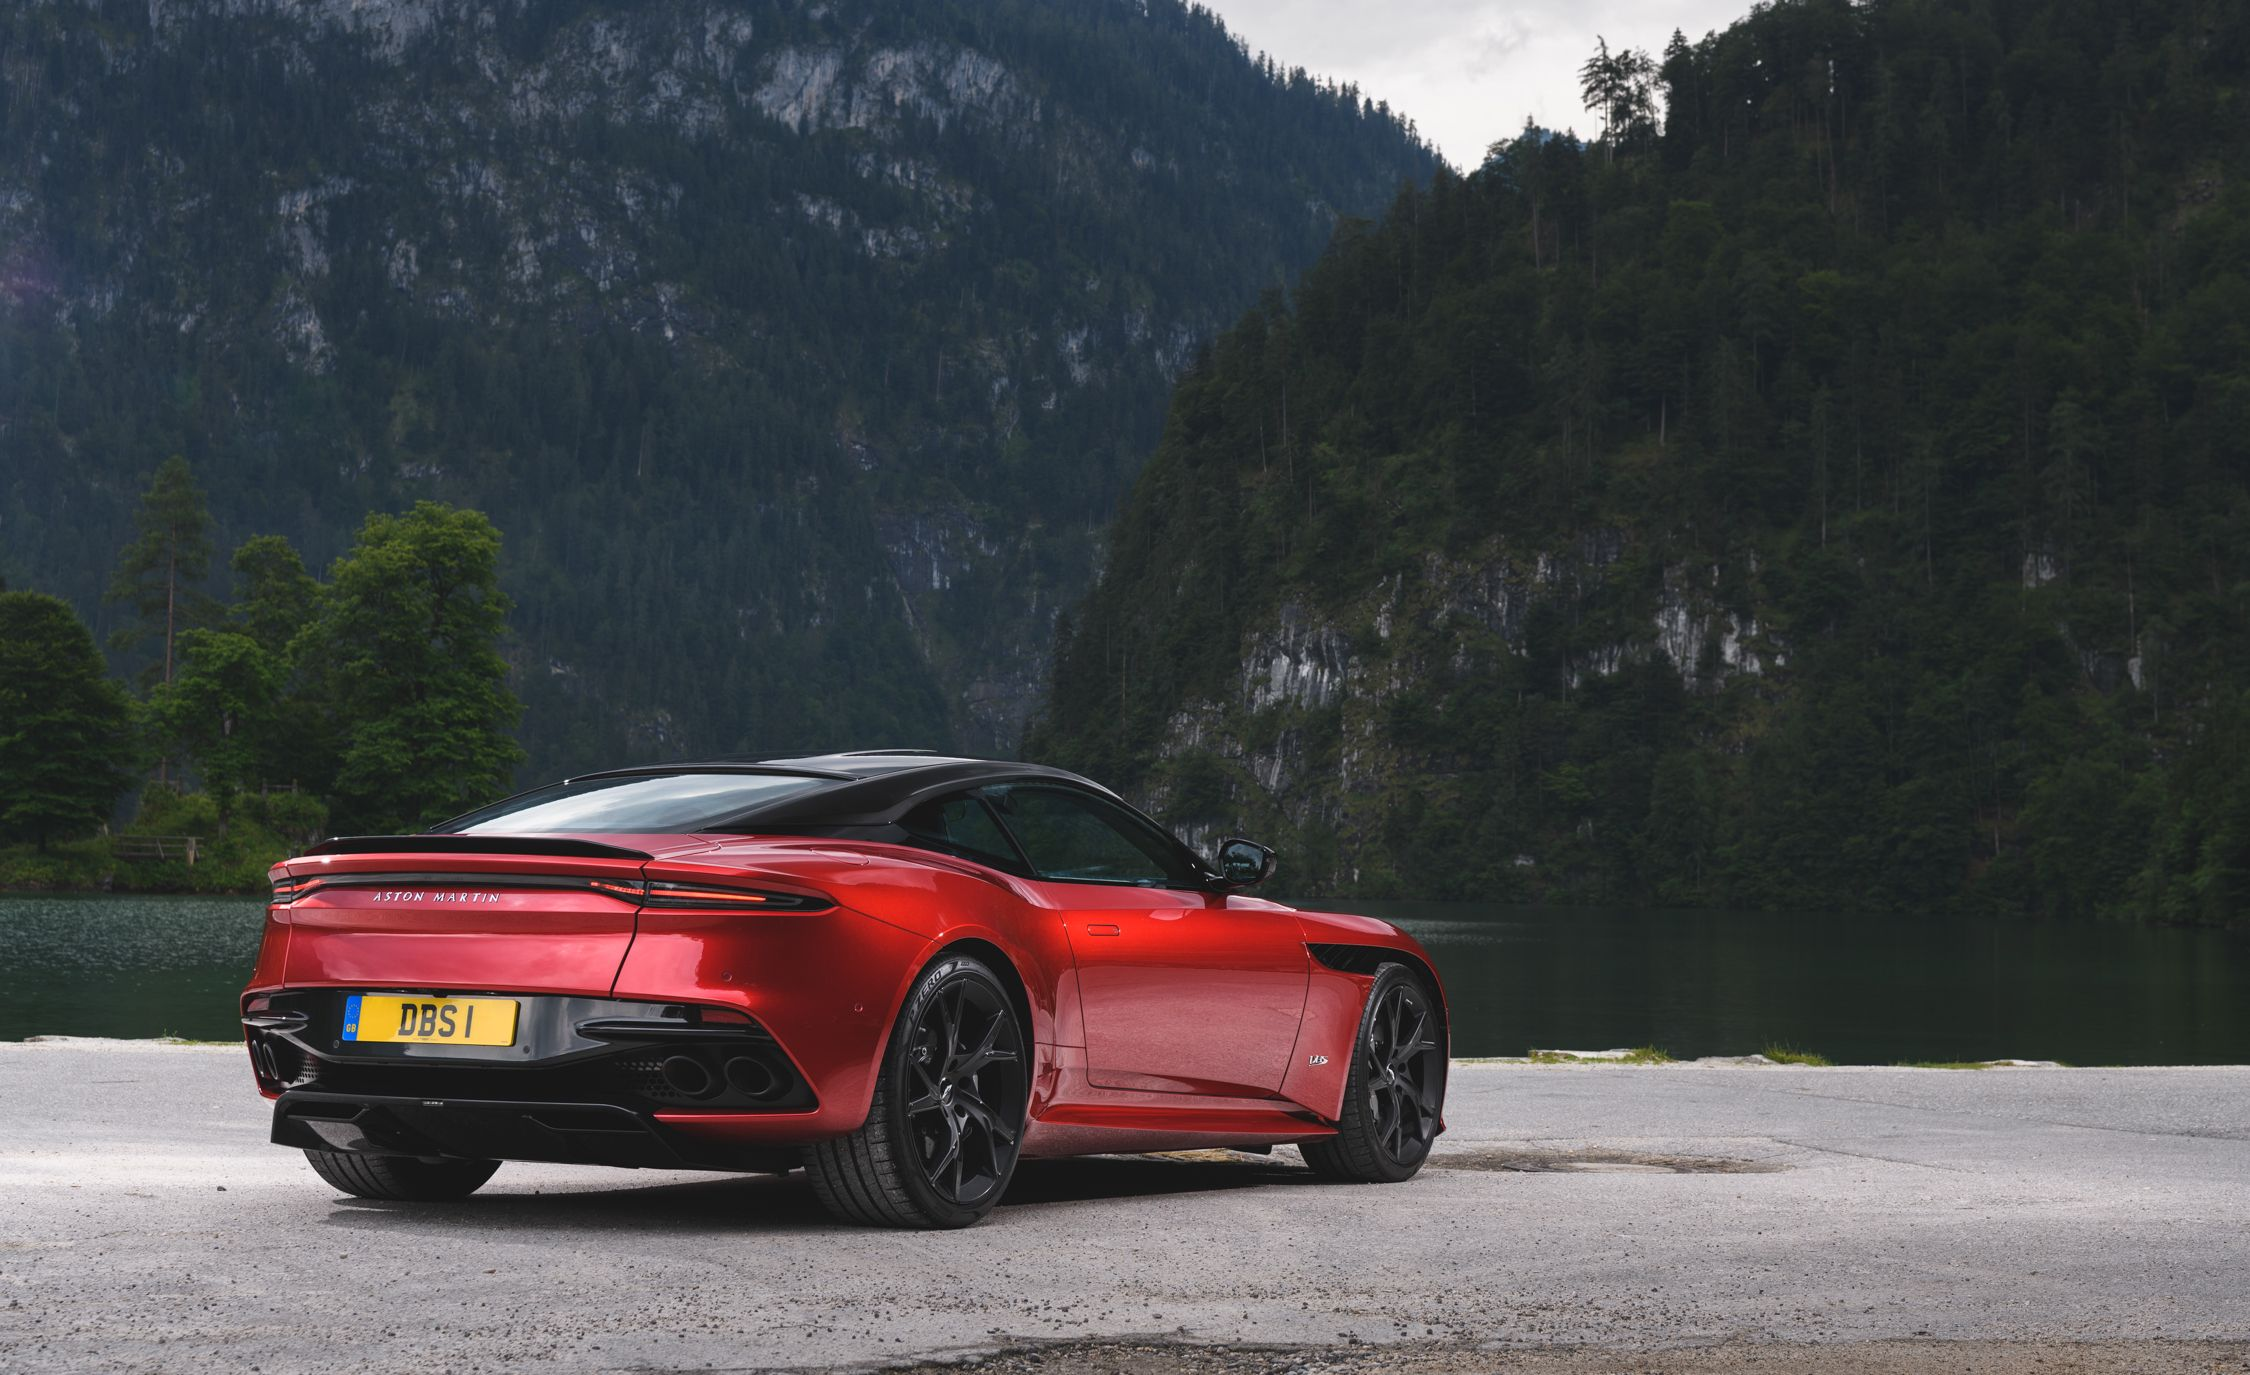 Aston Martin DBS Superleggera Reviews Aston Martin DBS - Aston martin dbs